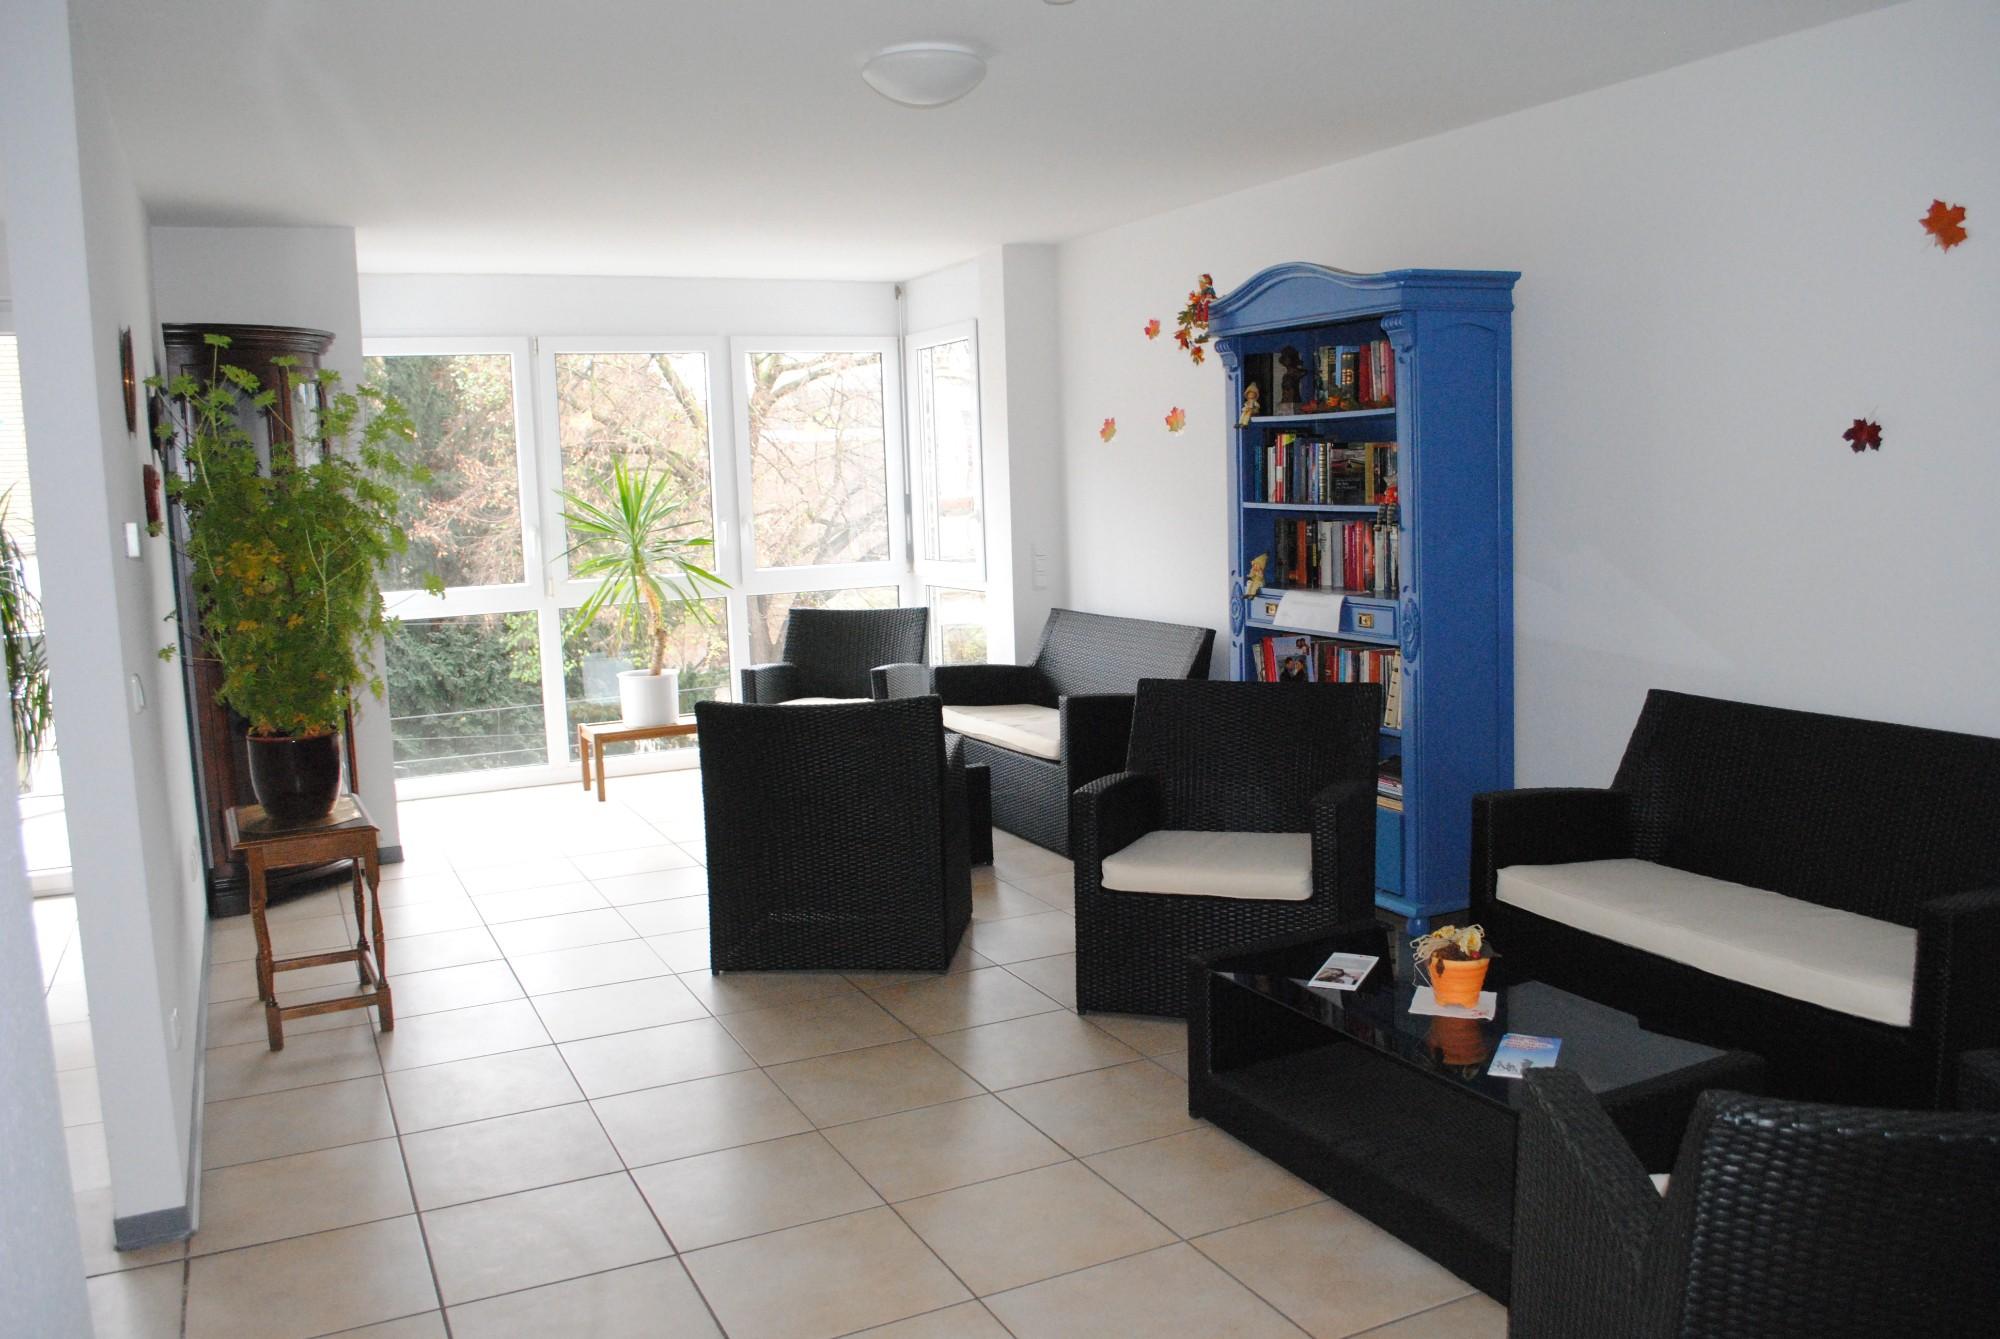 seniorenwohnungen gumbertstra e in d sseldorf eller. Black Bedroom Furniture Sets. Home Design Ideas